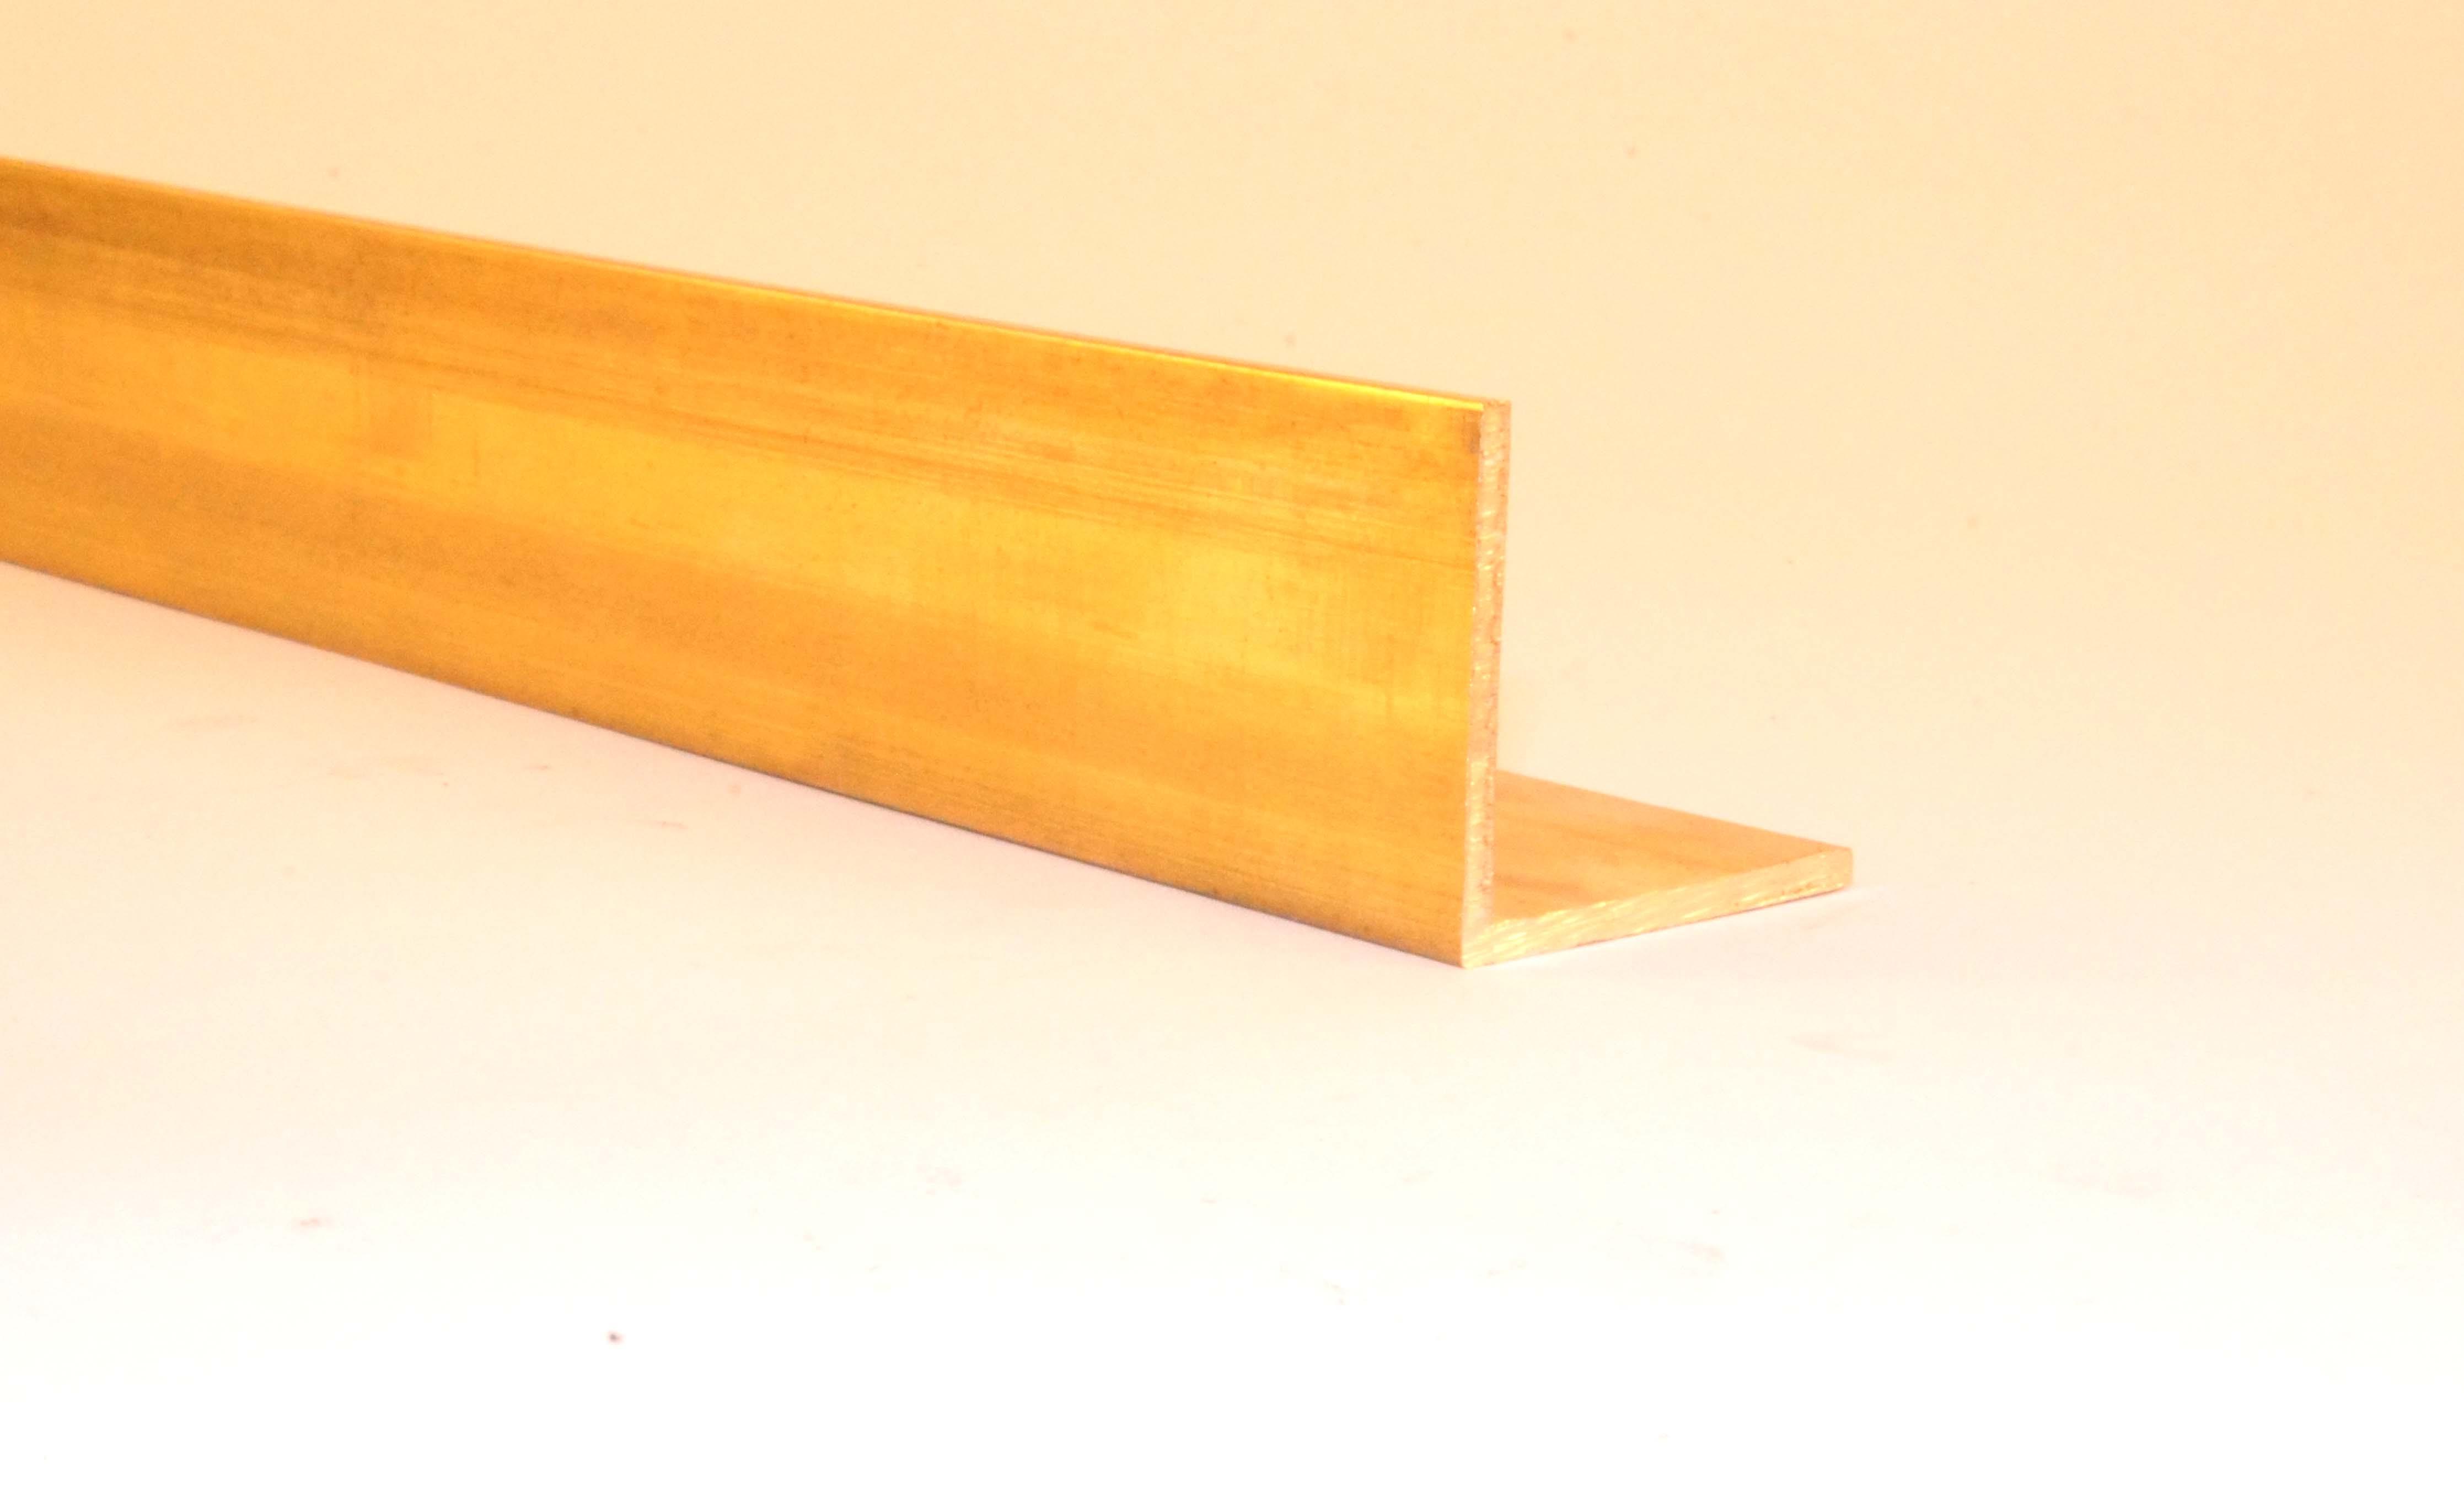 Messing Vierkantrohr 8x8x1 mm //500mm Länge CuZn37 MS63  Rohr